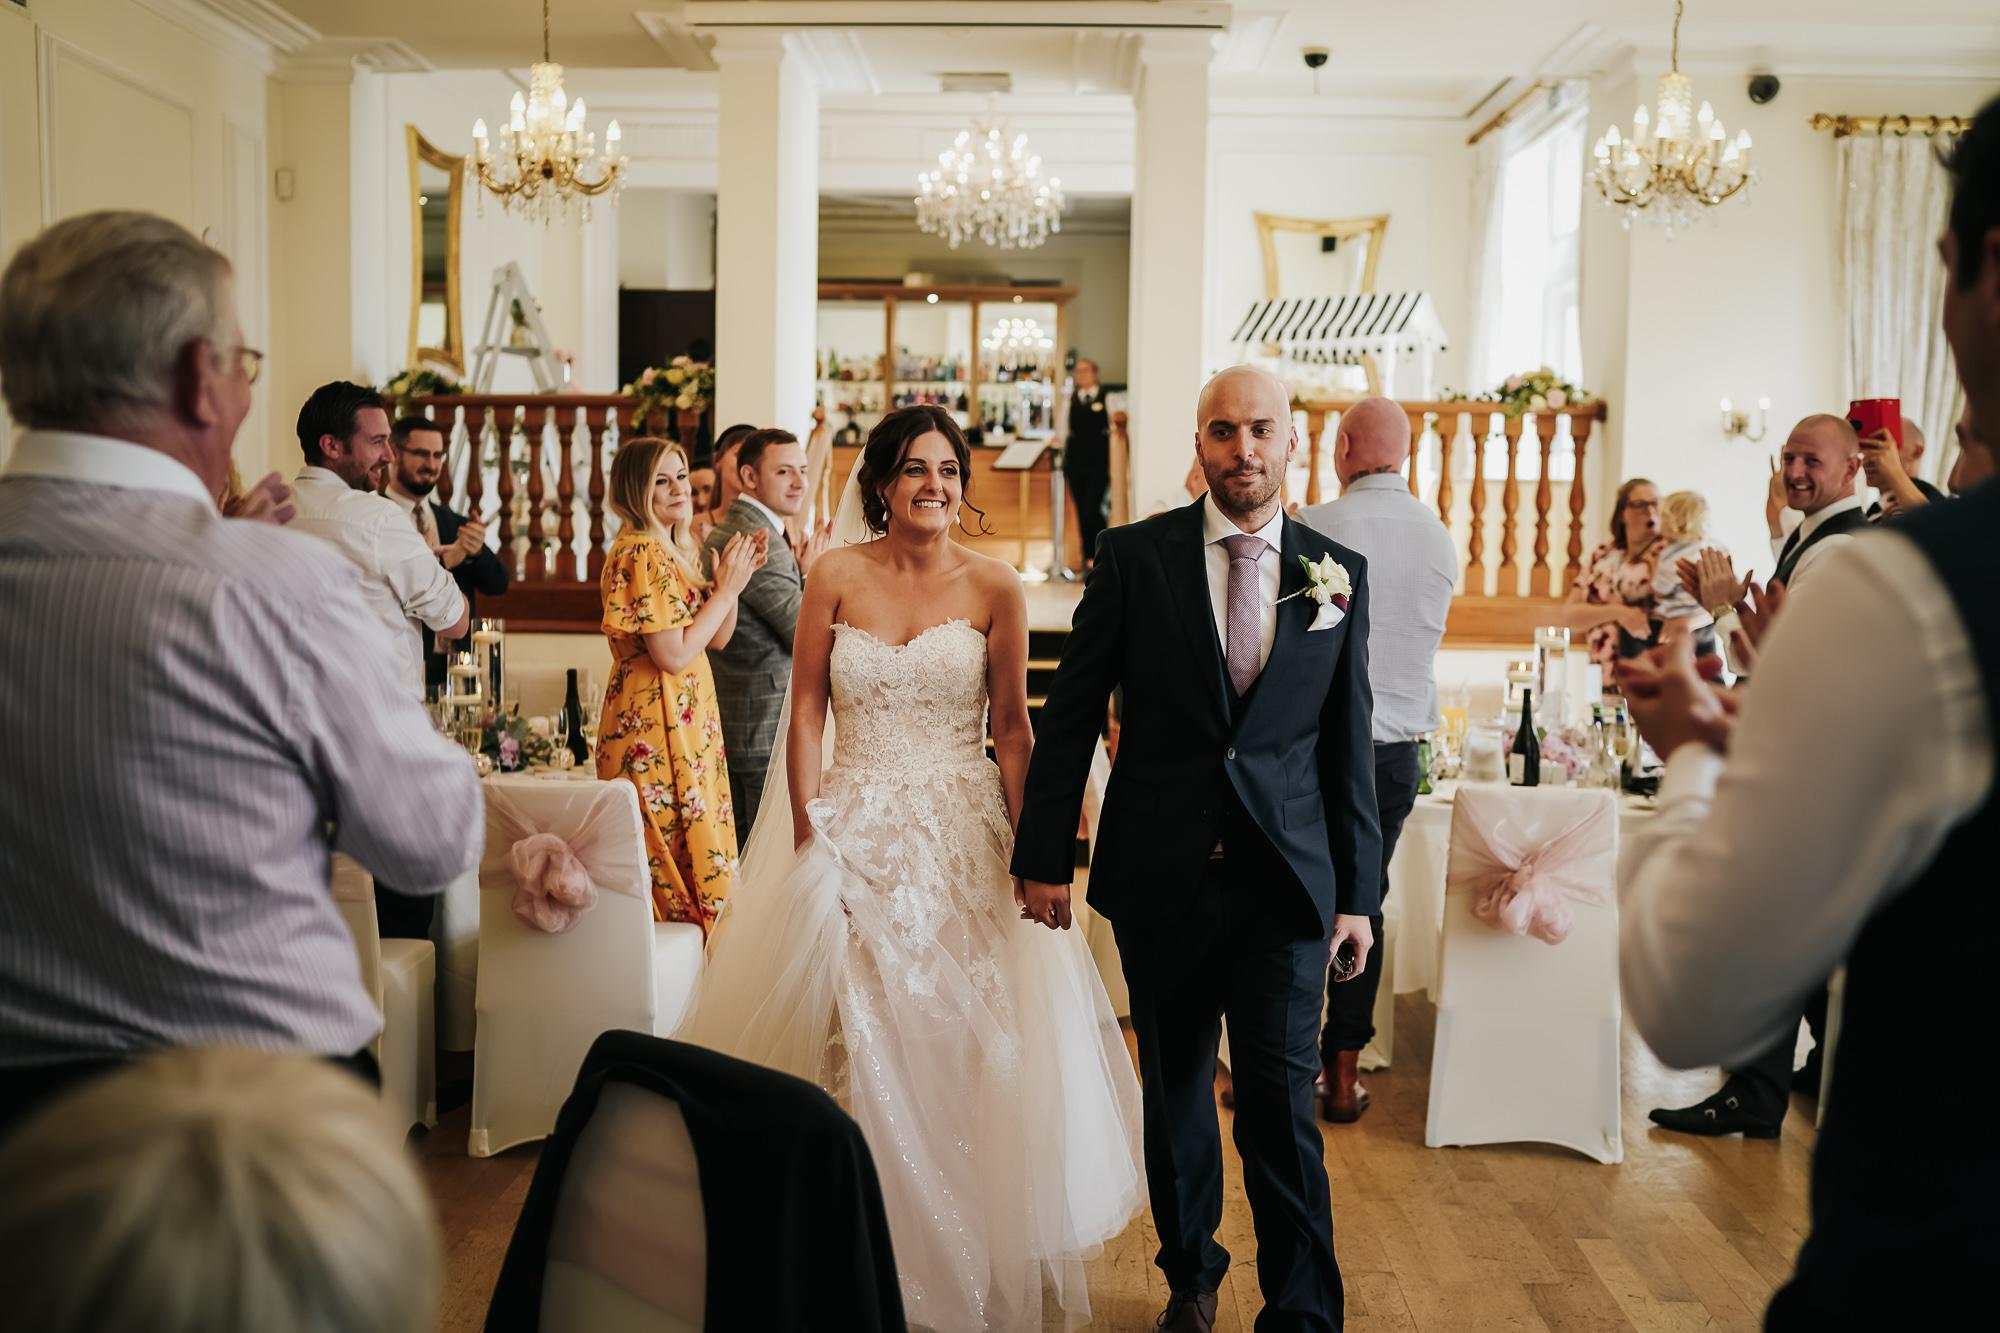 West Tower Wedding Venue Orkskirk Lancashire Wedding Photography cheshire wedding photographer (35 of 47).jpg